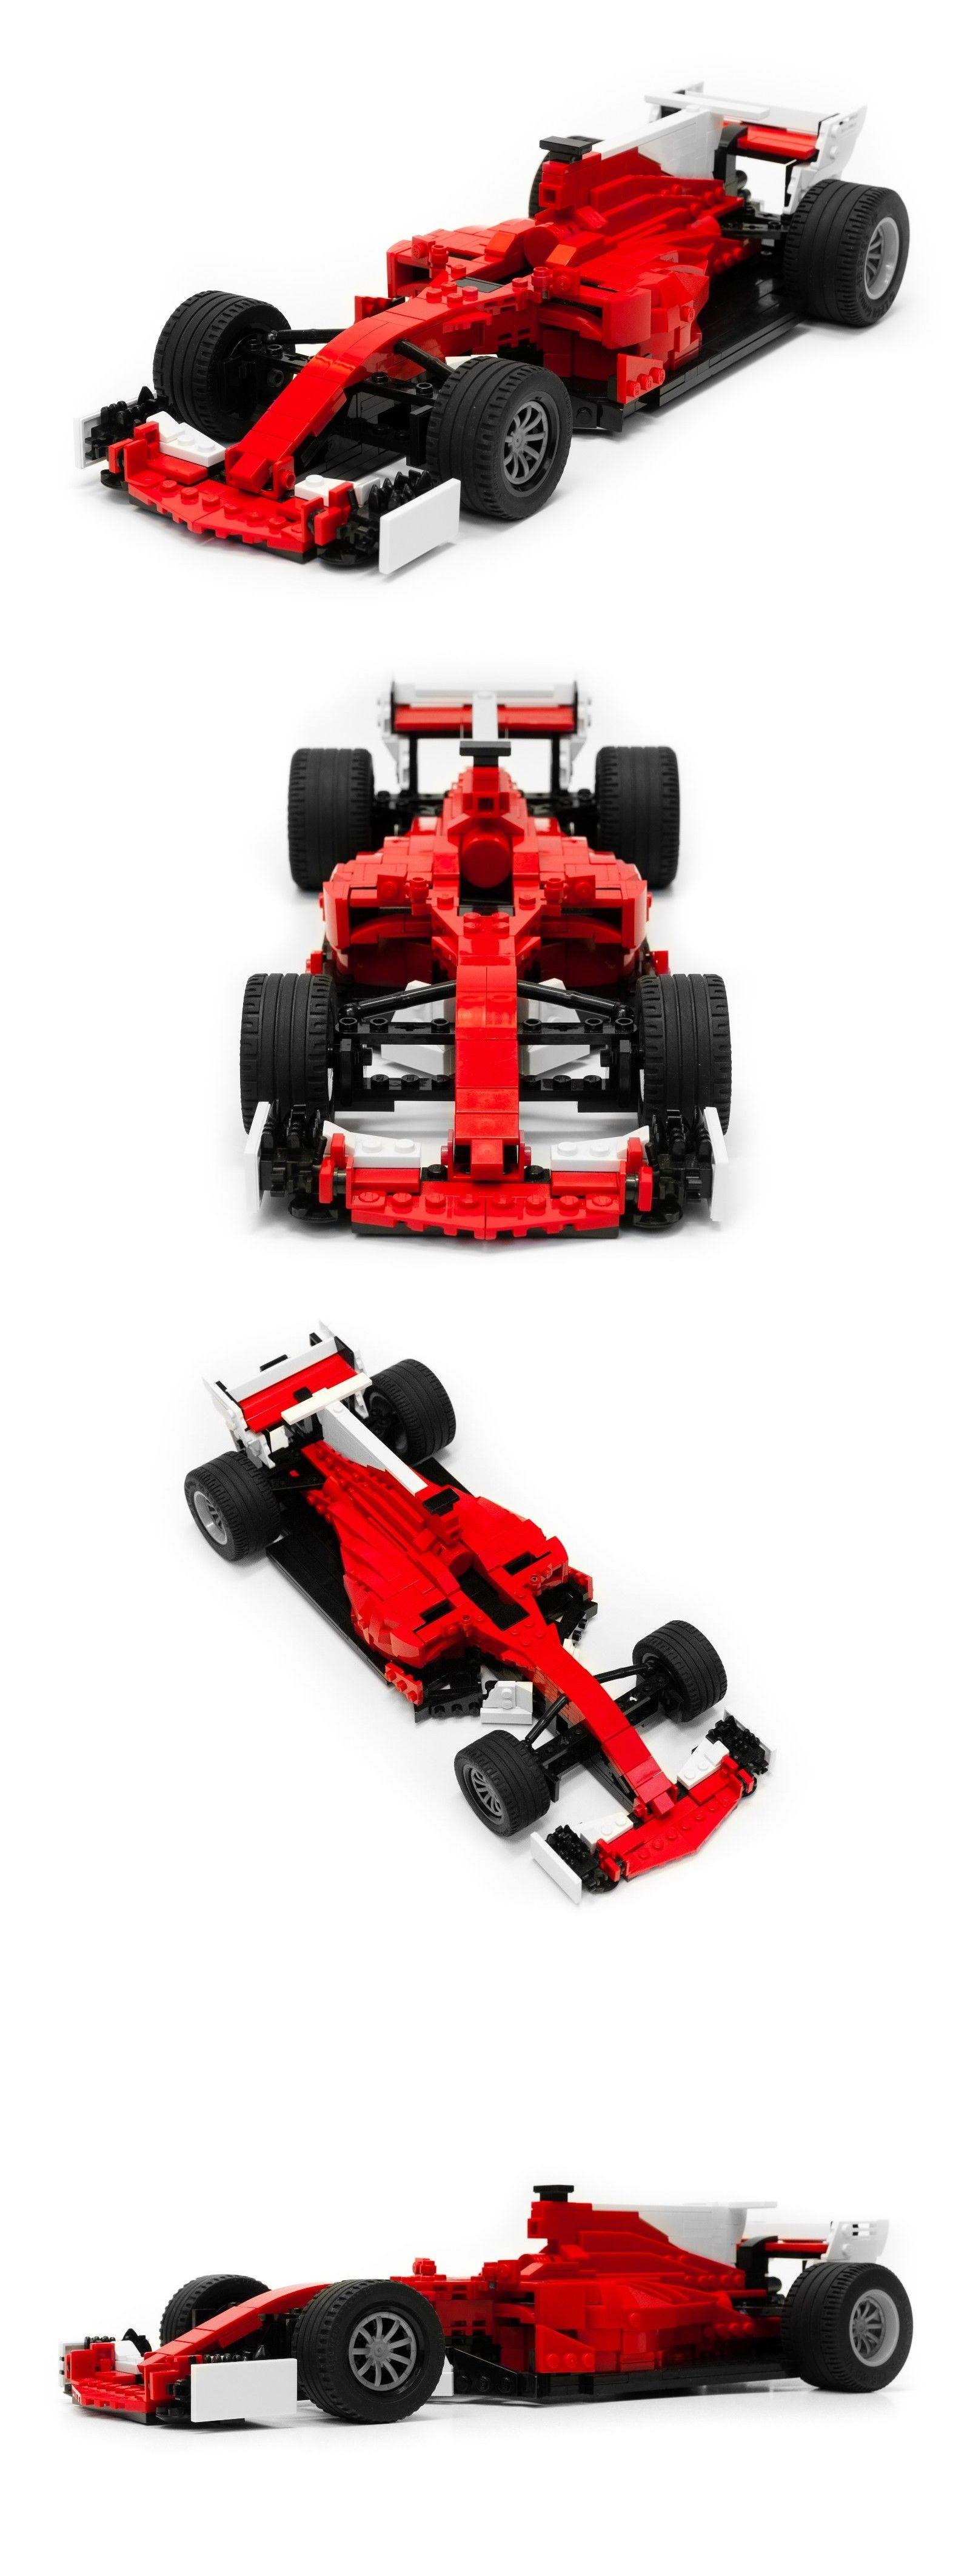 Lego Instruction Manuals 183449 Lego Ferrari Sf70h Formula 1 F1 Race Car Custom Instructions Buy It Now Only 14 99 On E Lego Toy Sale Lego Instructions